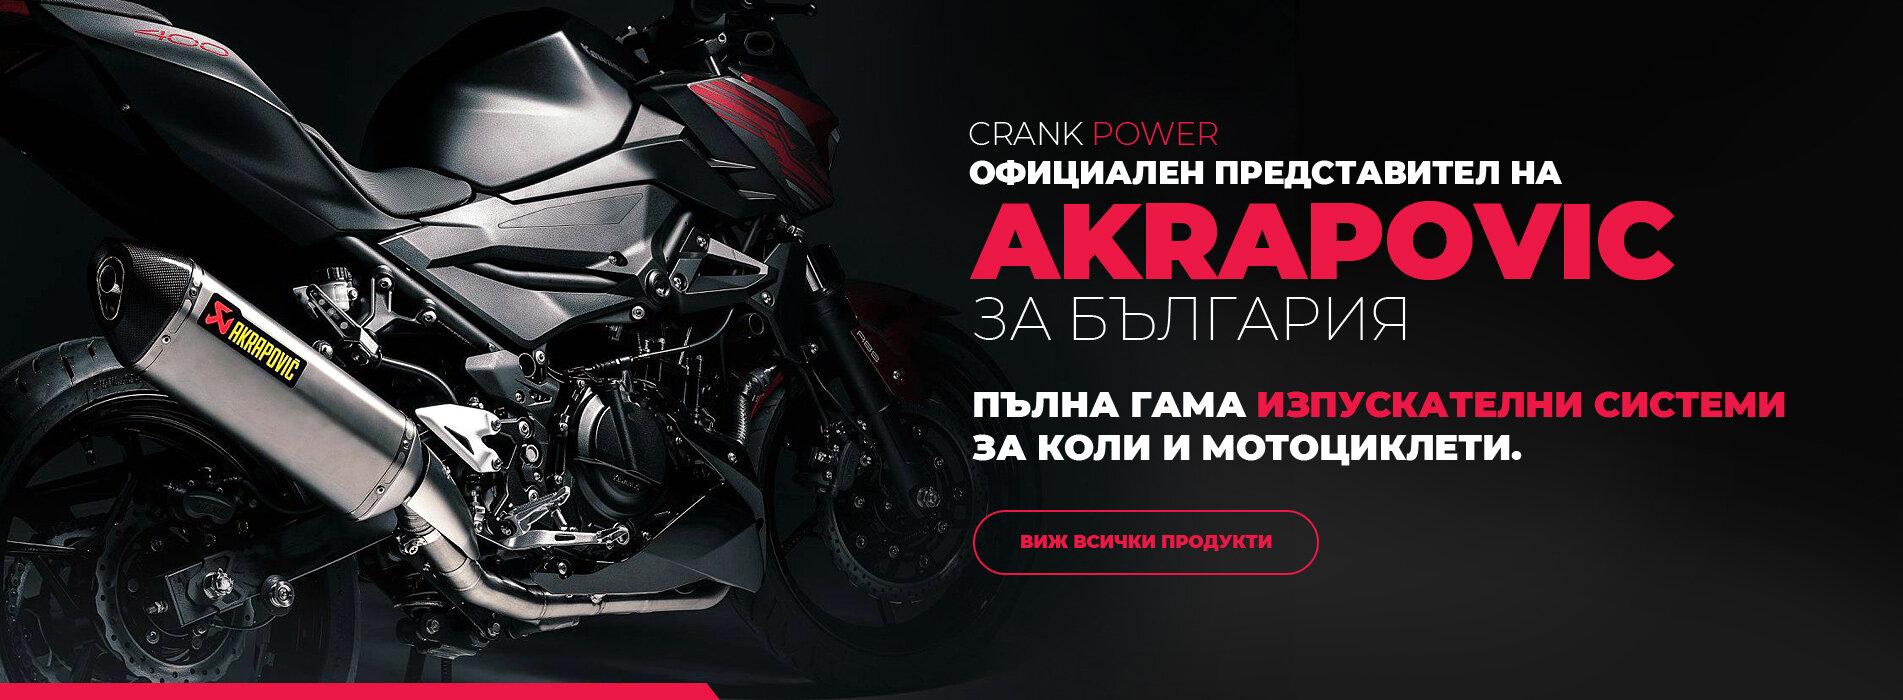 Akrapovic MOTO